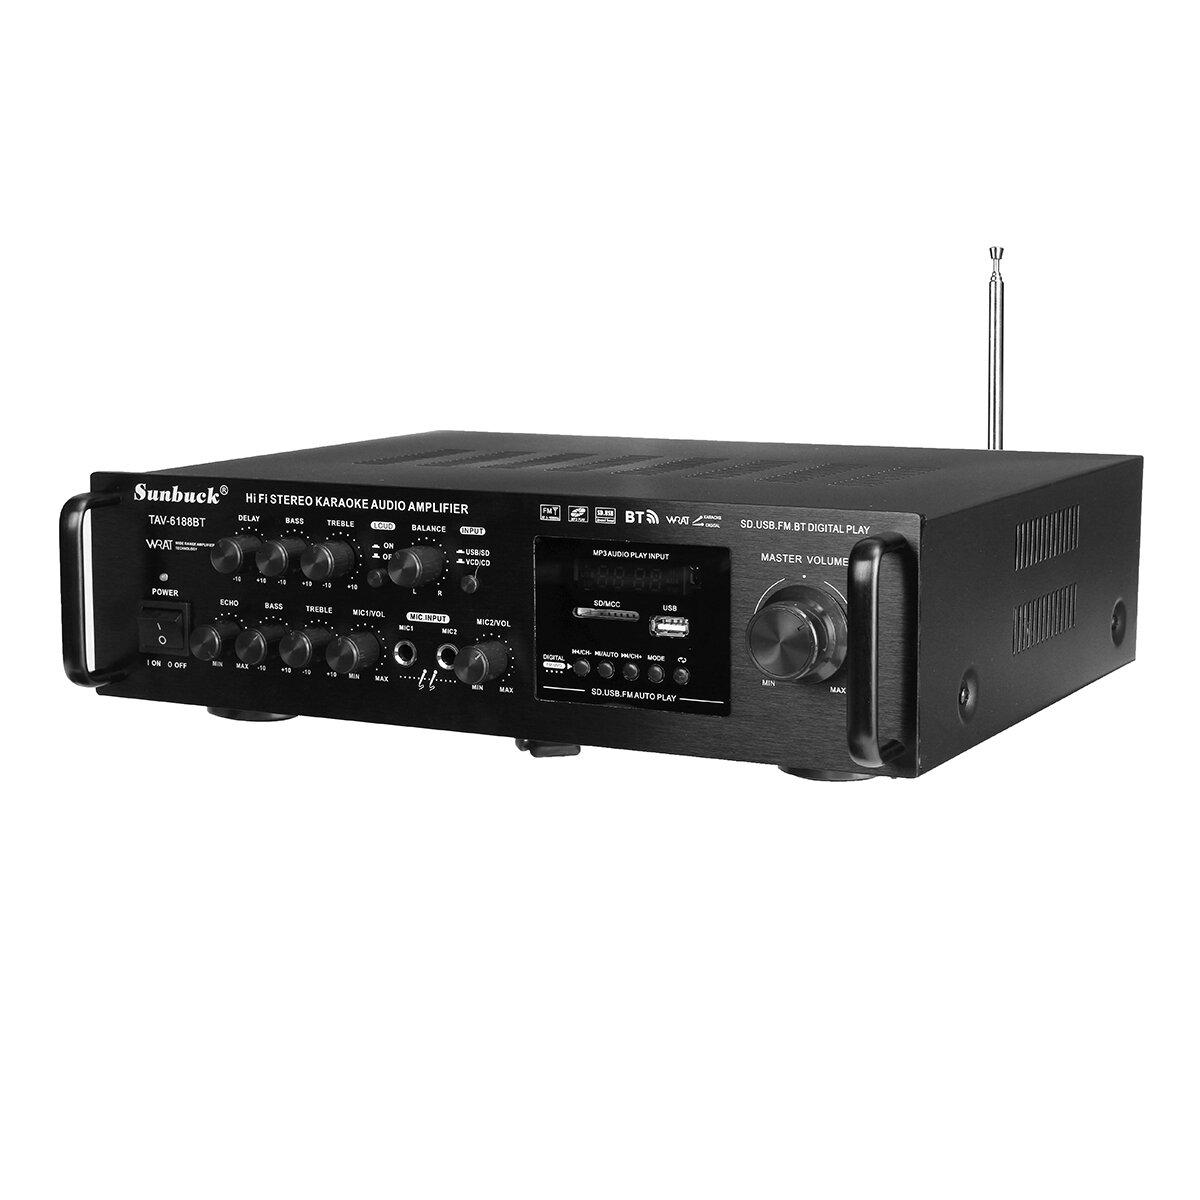 Sunbuck TAV-6188BT 2000W 4ohm Setero Bluetooth FMカラオケアンプRCサポート2マイク